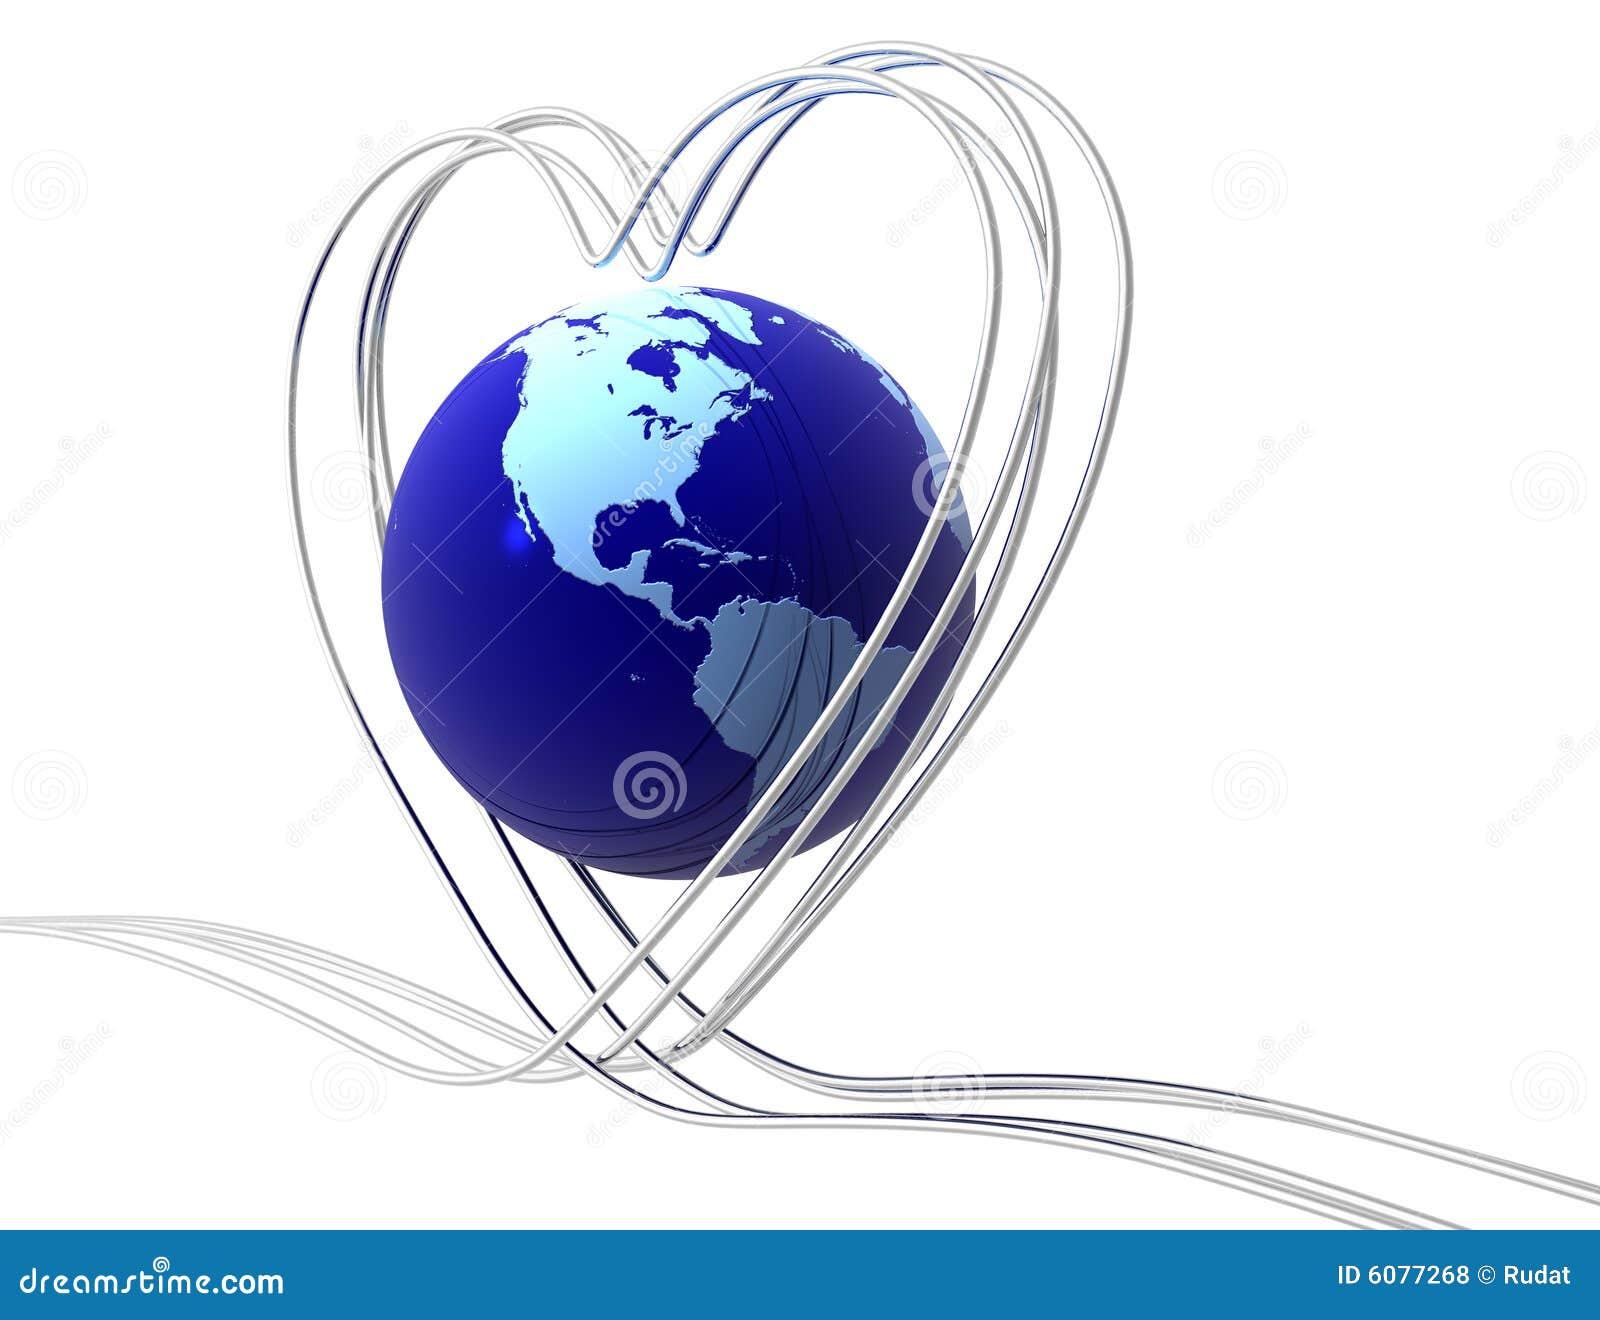 digital world hearts dreamscene - photo #23